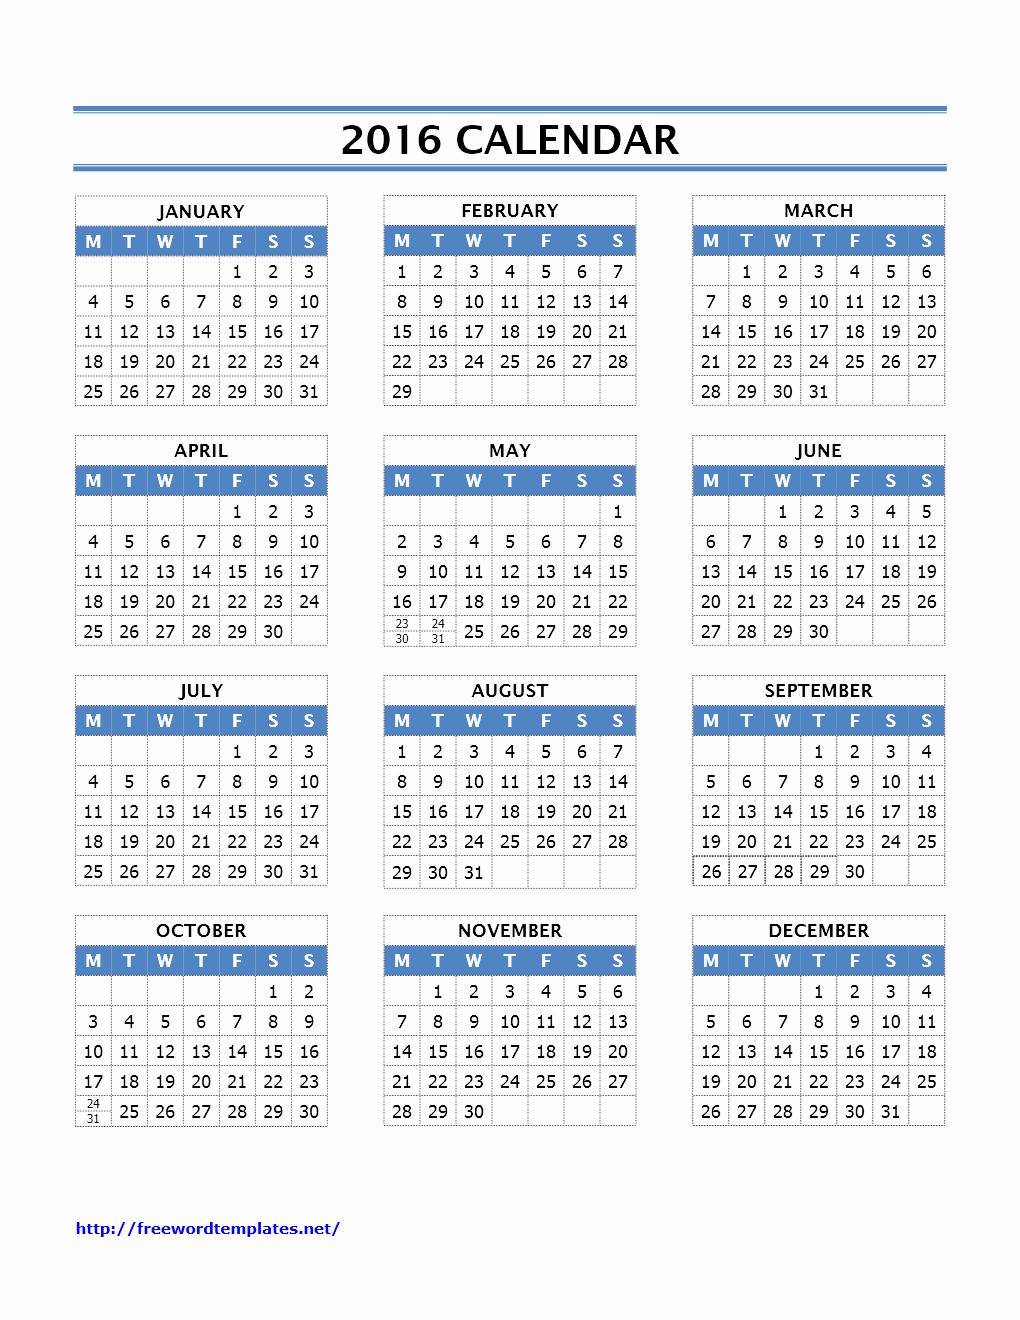 Free Printable Calendars 2016 Templates Beautiful 2016 Calendar Templates